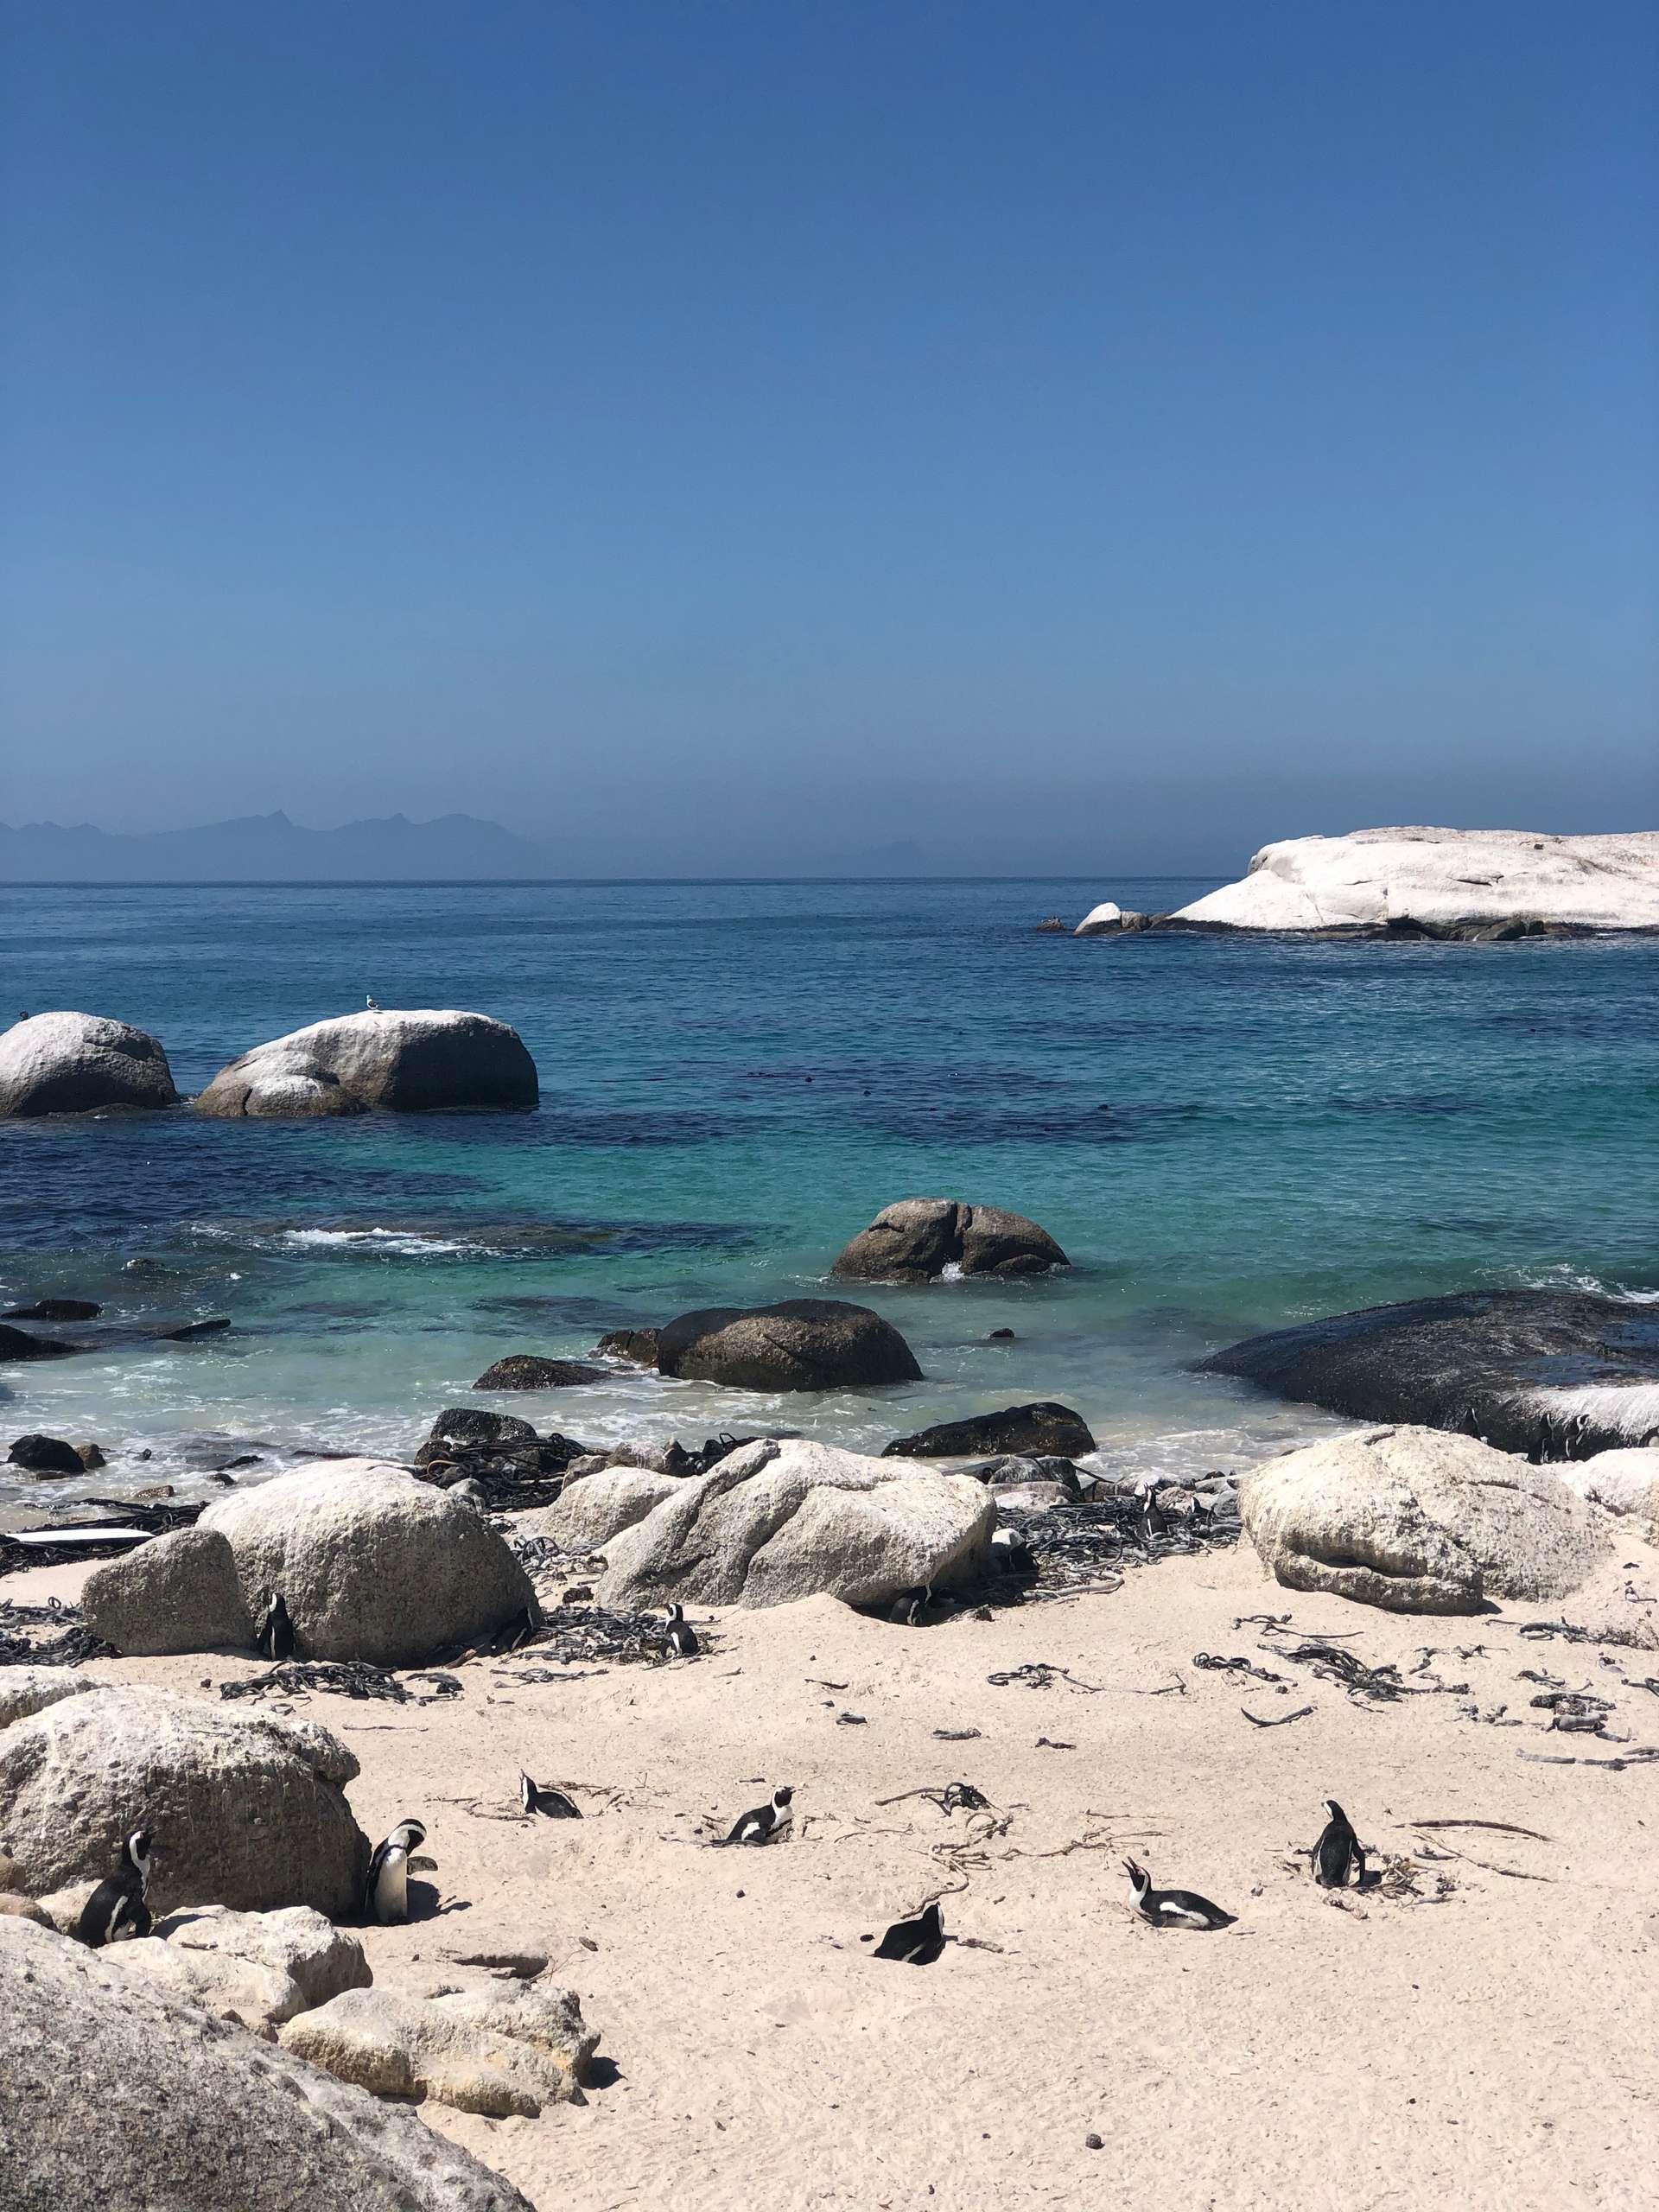 Zuid-Afrika, Kaapstad, pinguinstrand